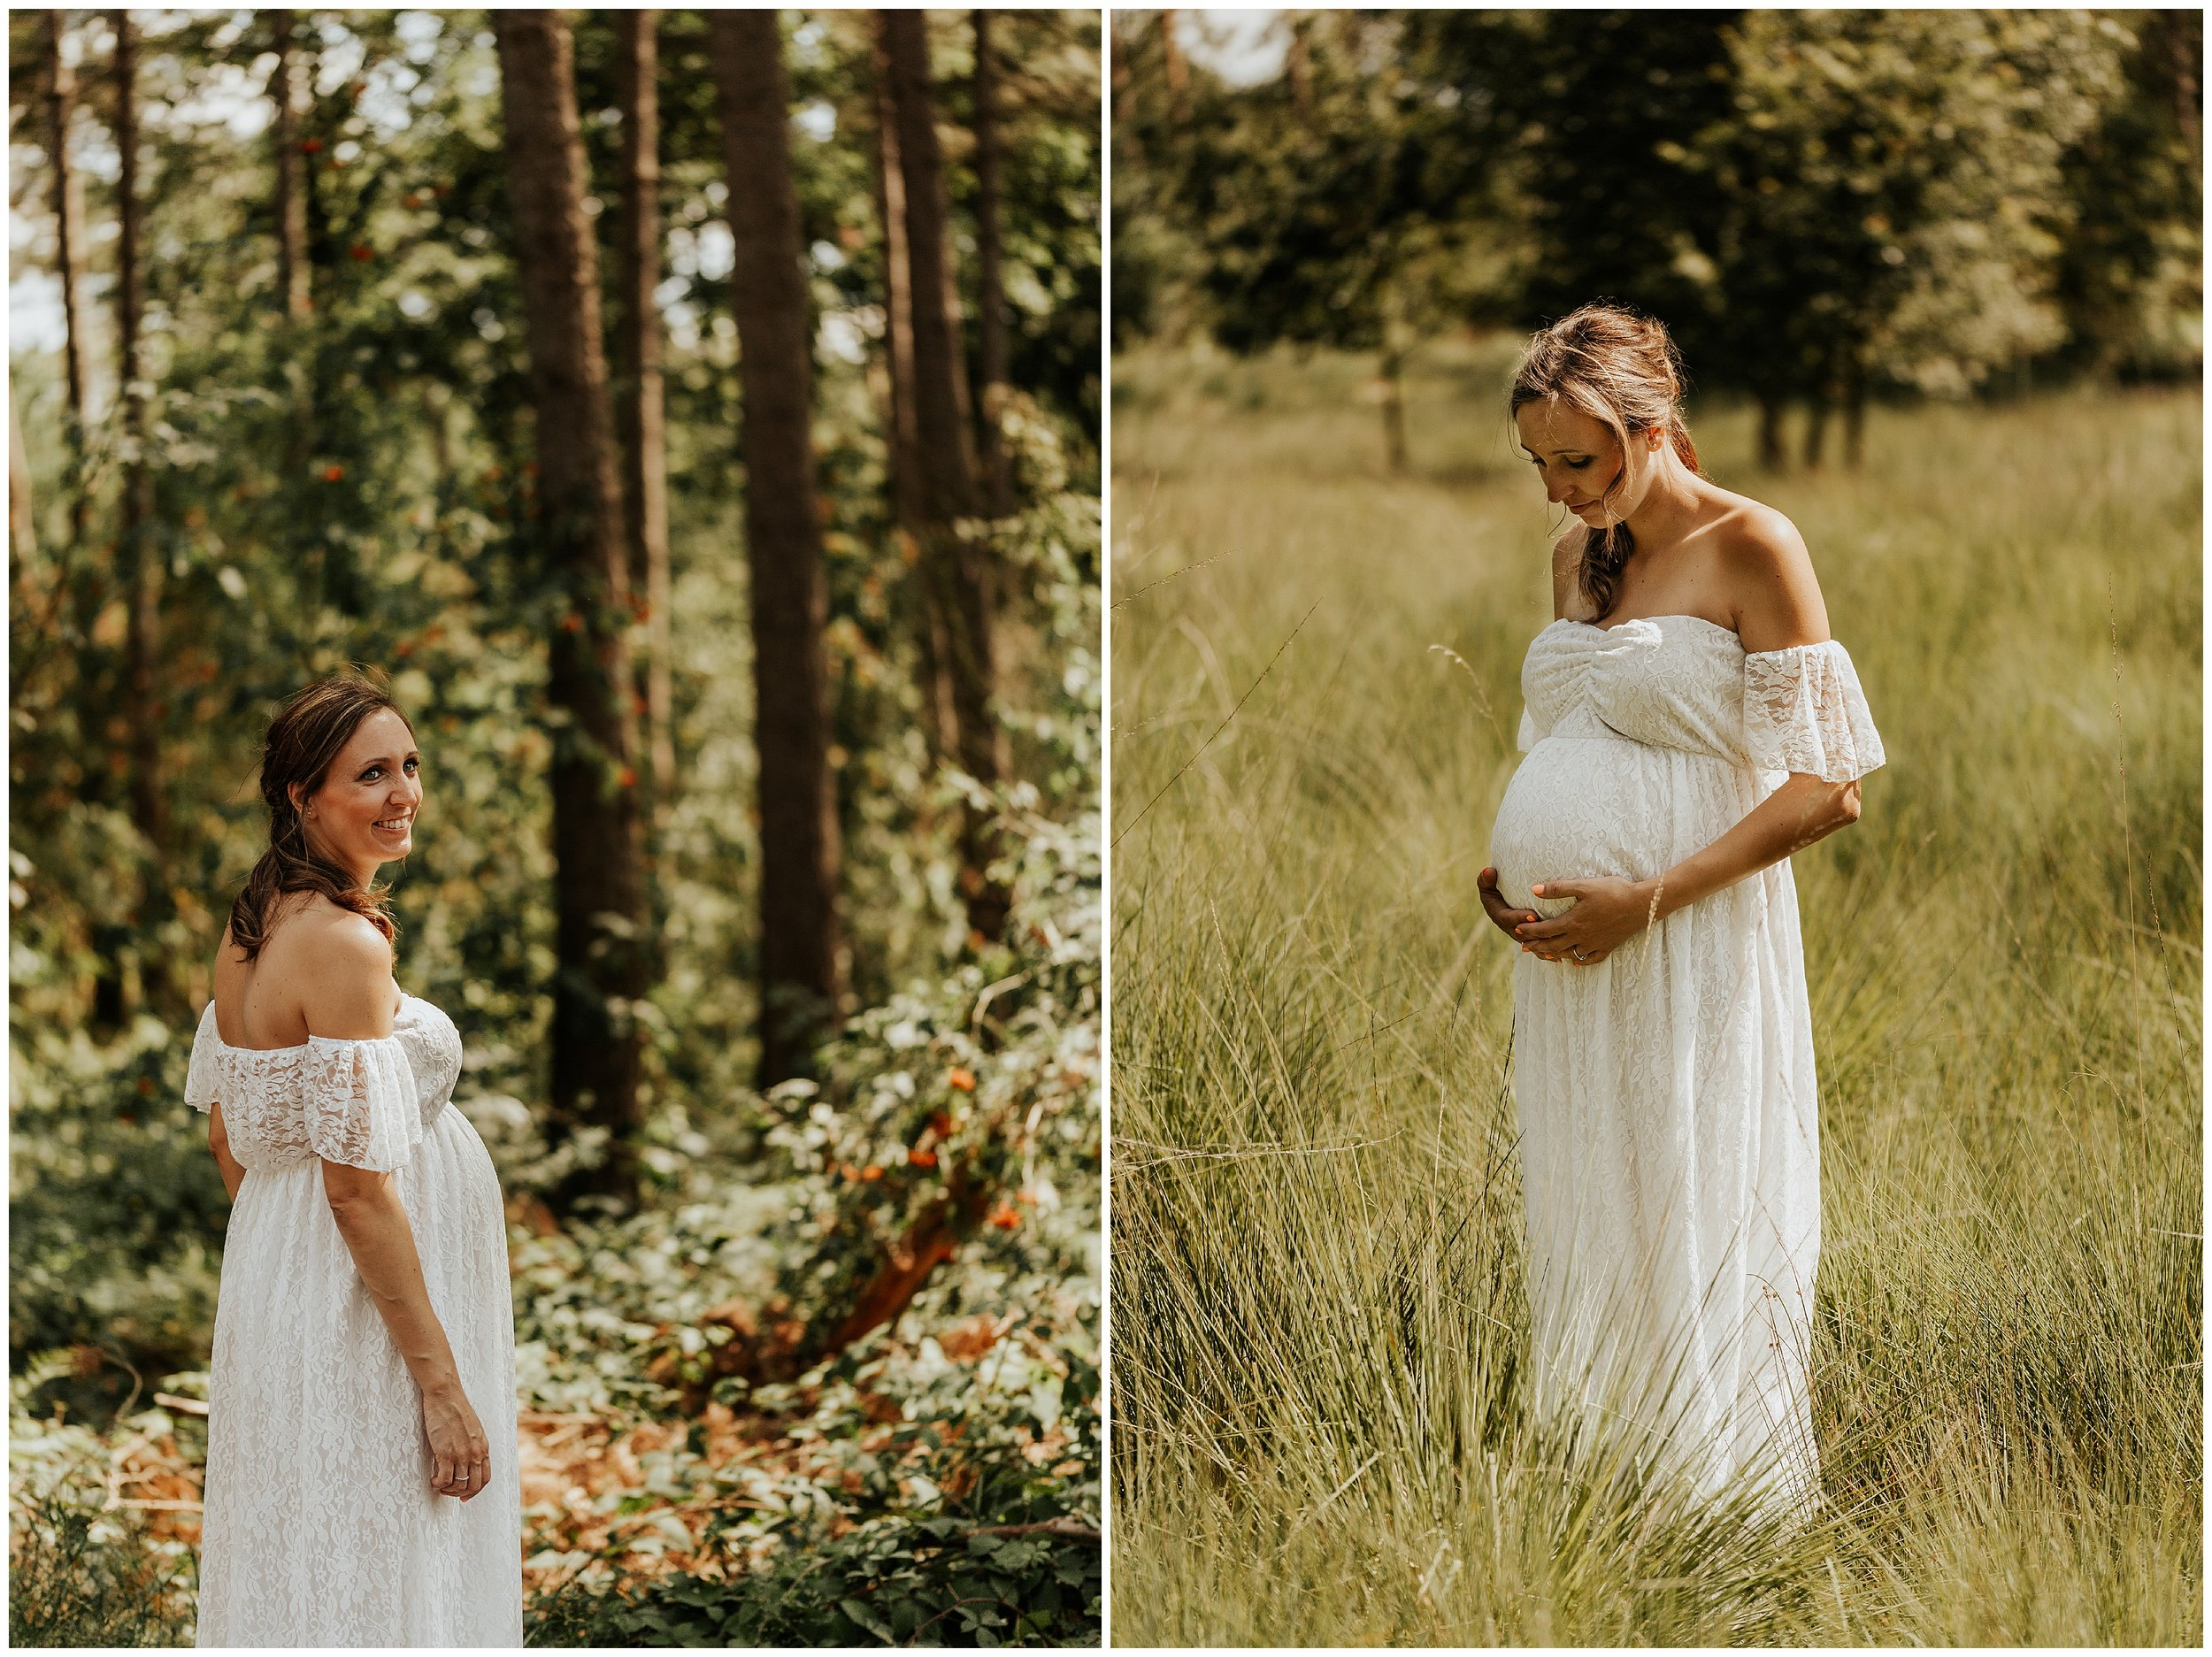 zwangerschapsfotografie-zwangerschapsfoto-lisa-helsen-herentals-kempen-belgie-antwerpen-zwangerschapsfotograaf_0004.jpg